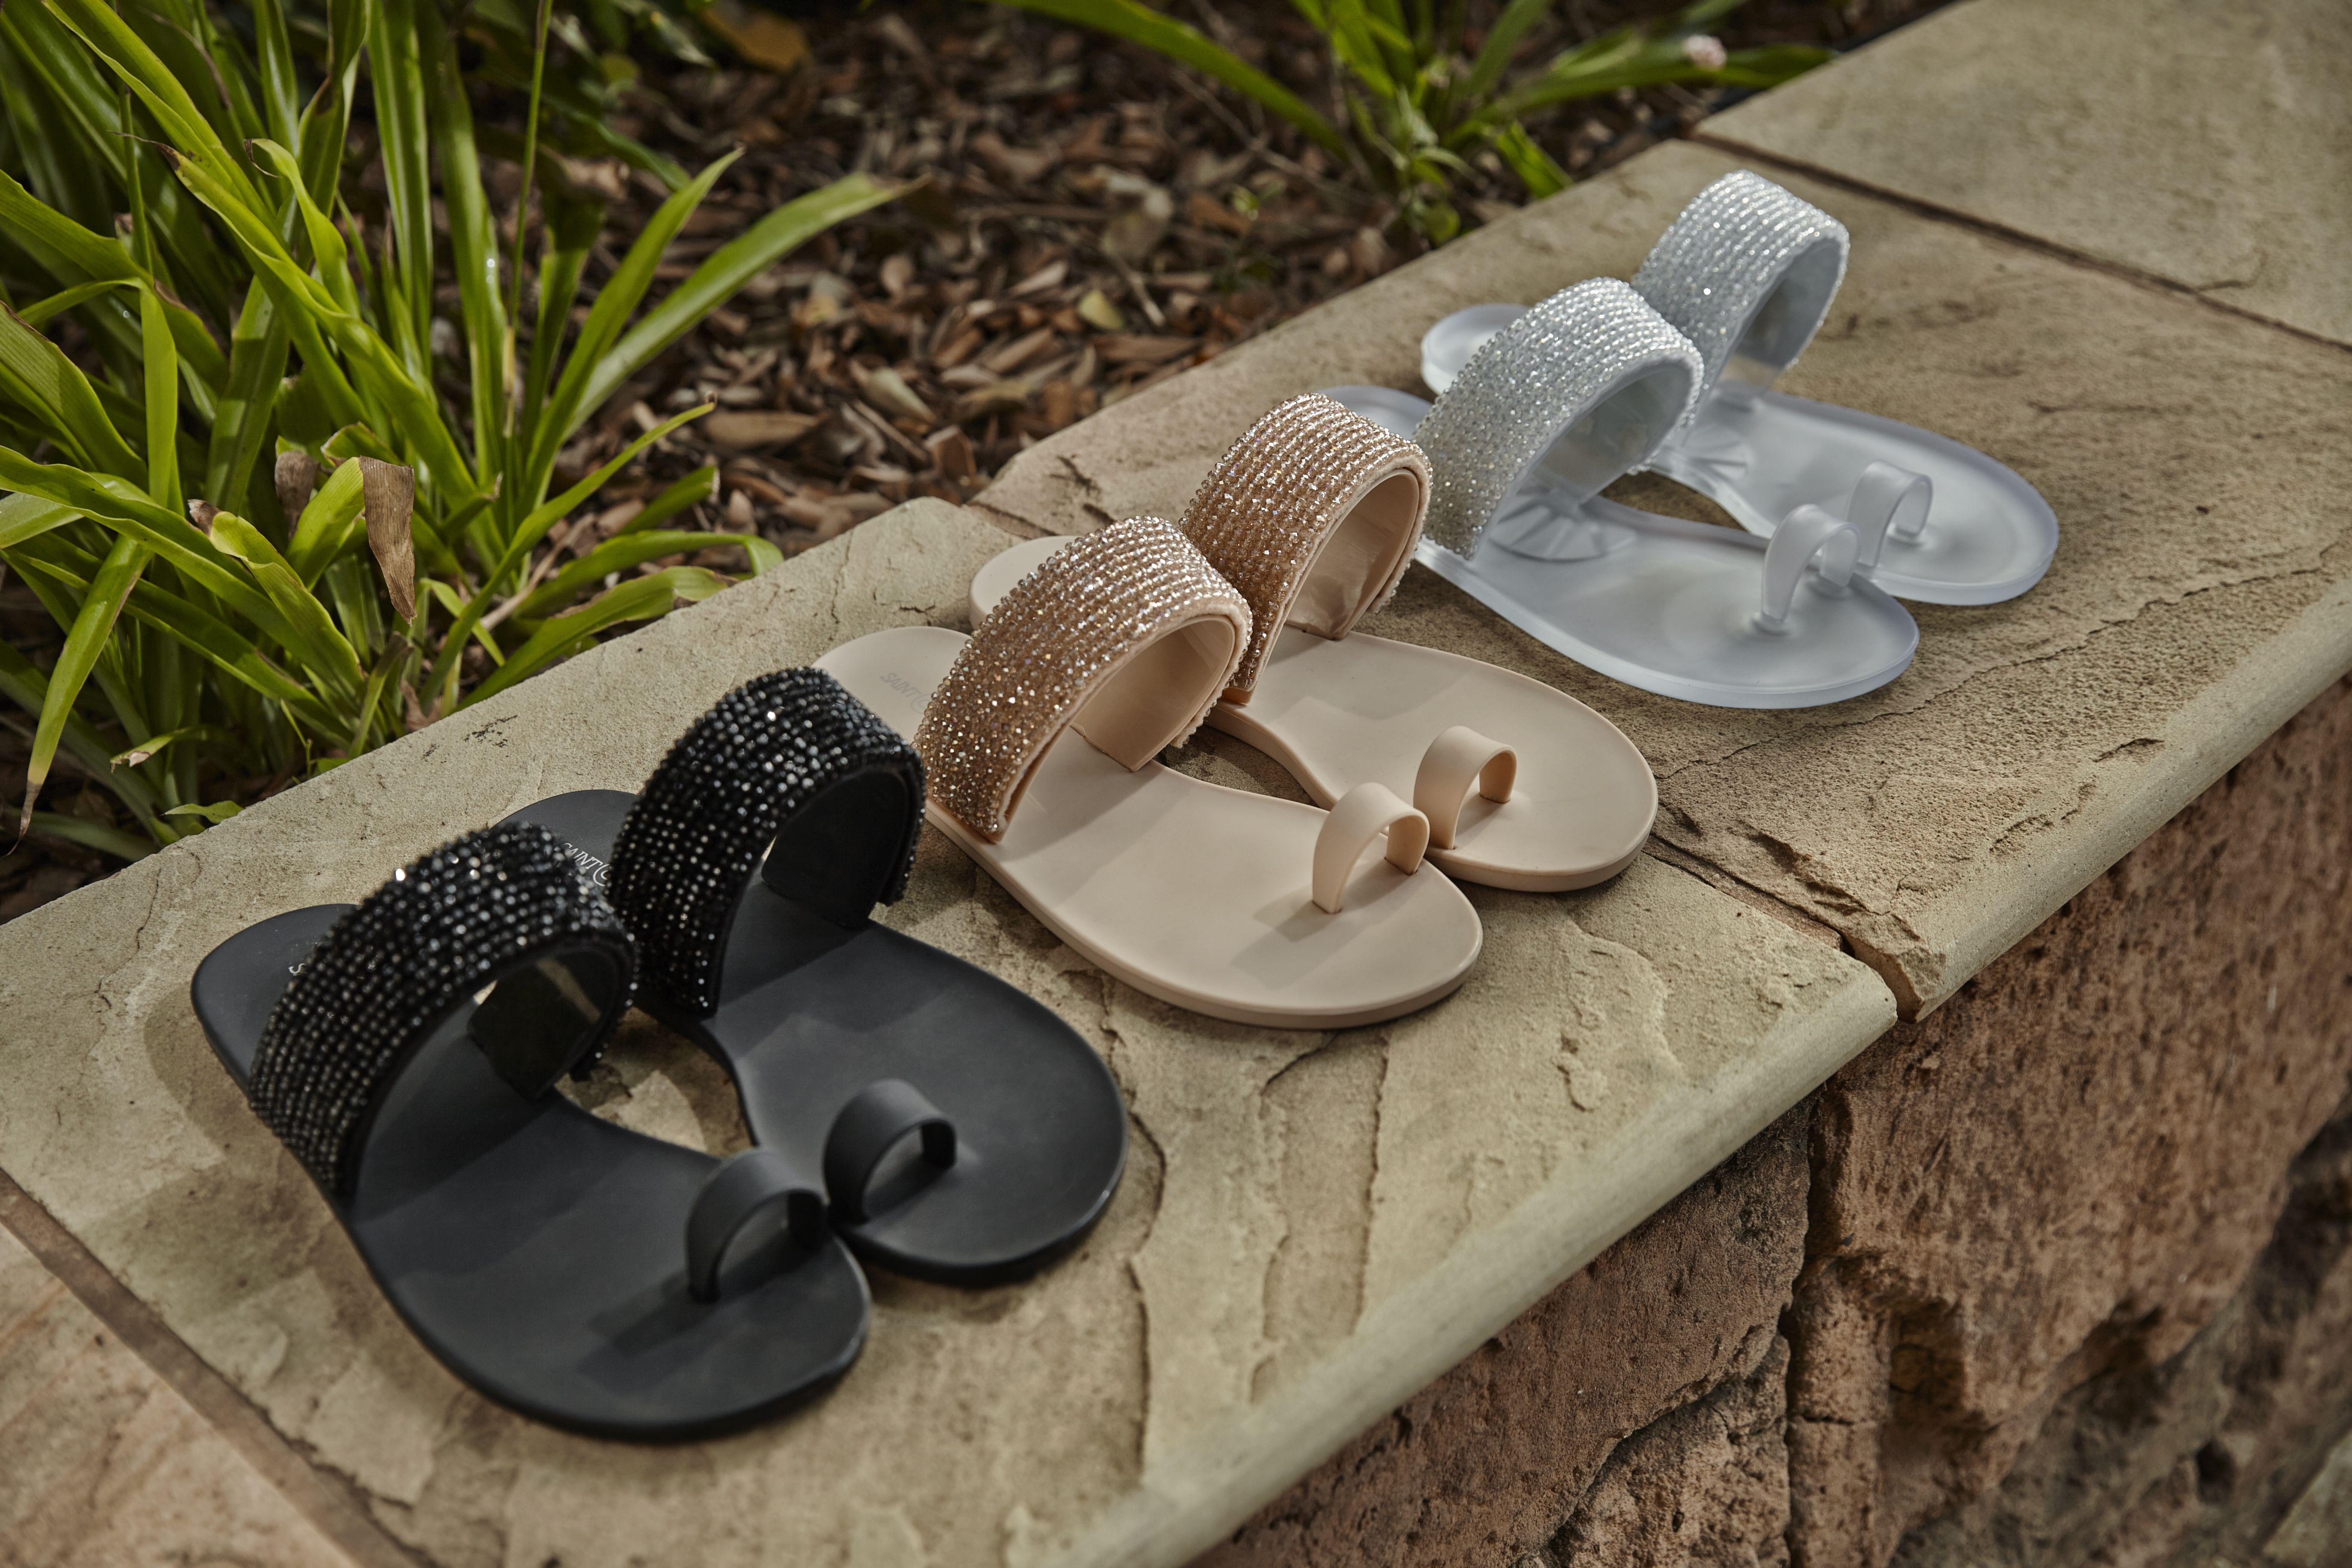 Yves Saint Laurent Beige Starfish Jelly Sandals Size 10.5